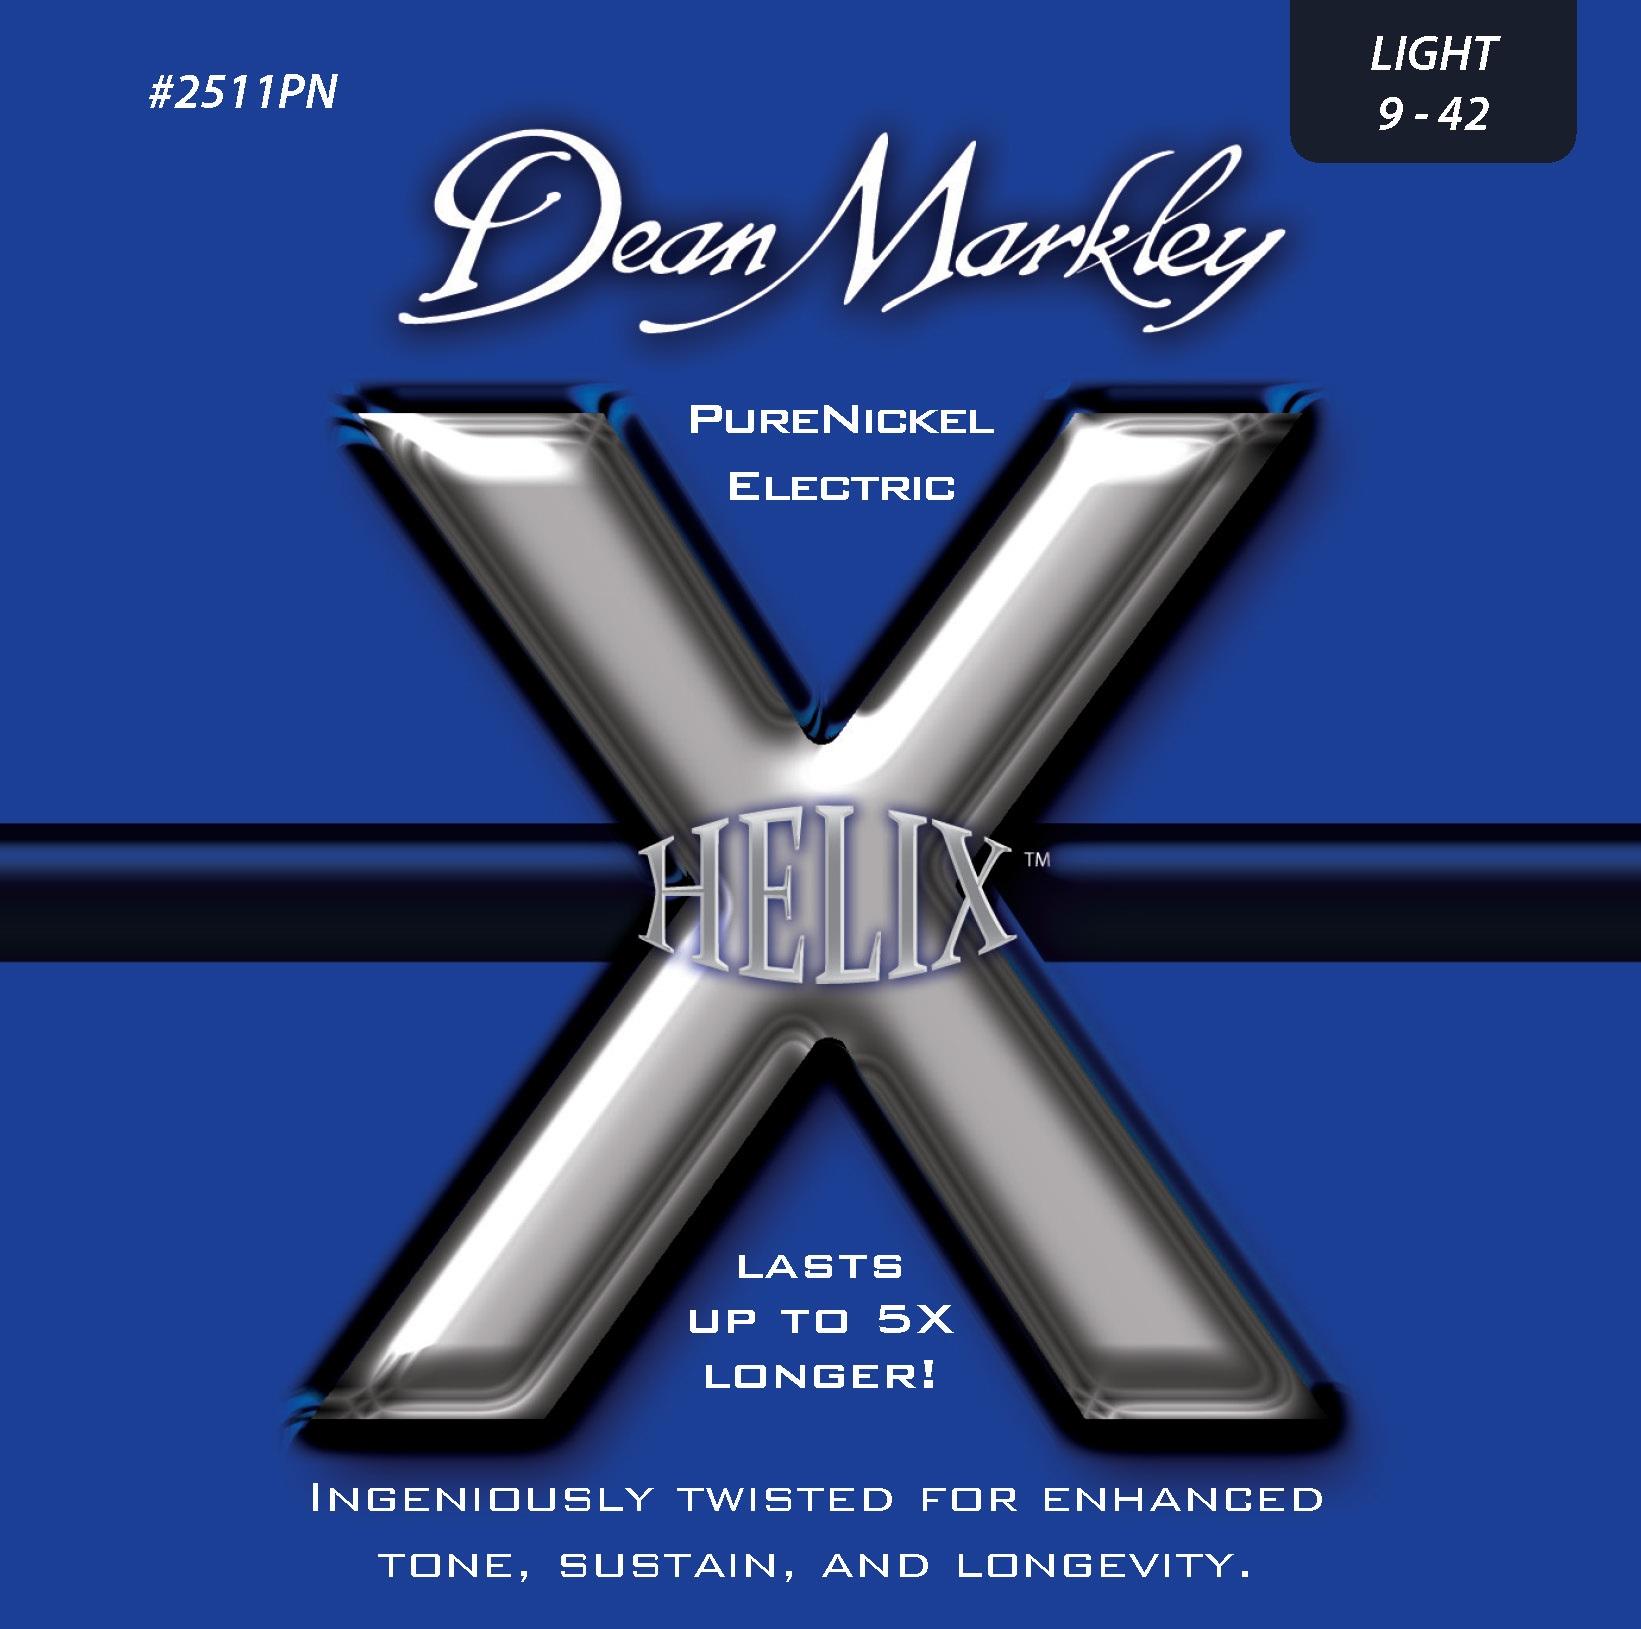 Dean Markley 2511PN LT 9-42 Helix PureNickel